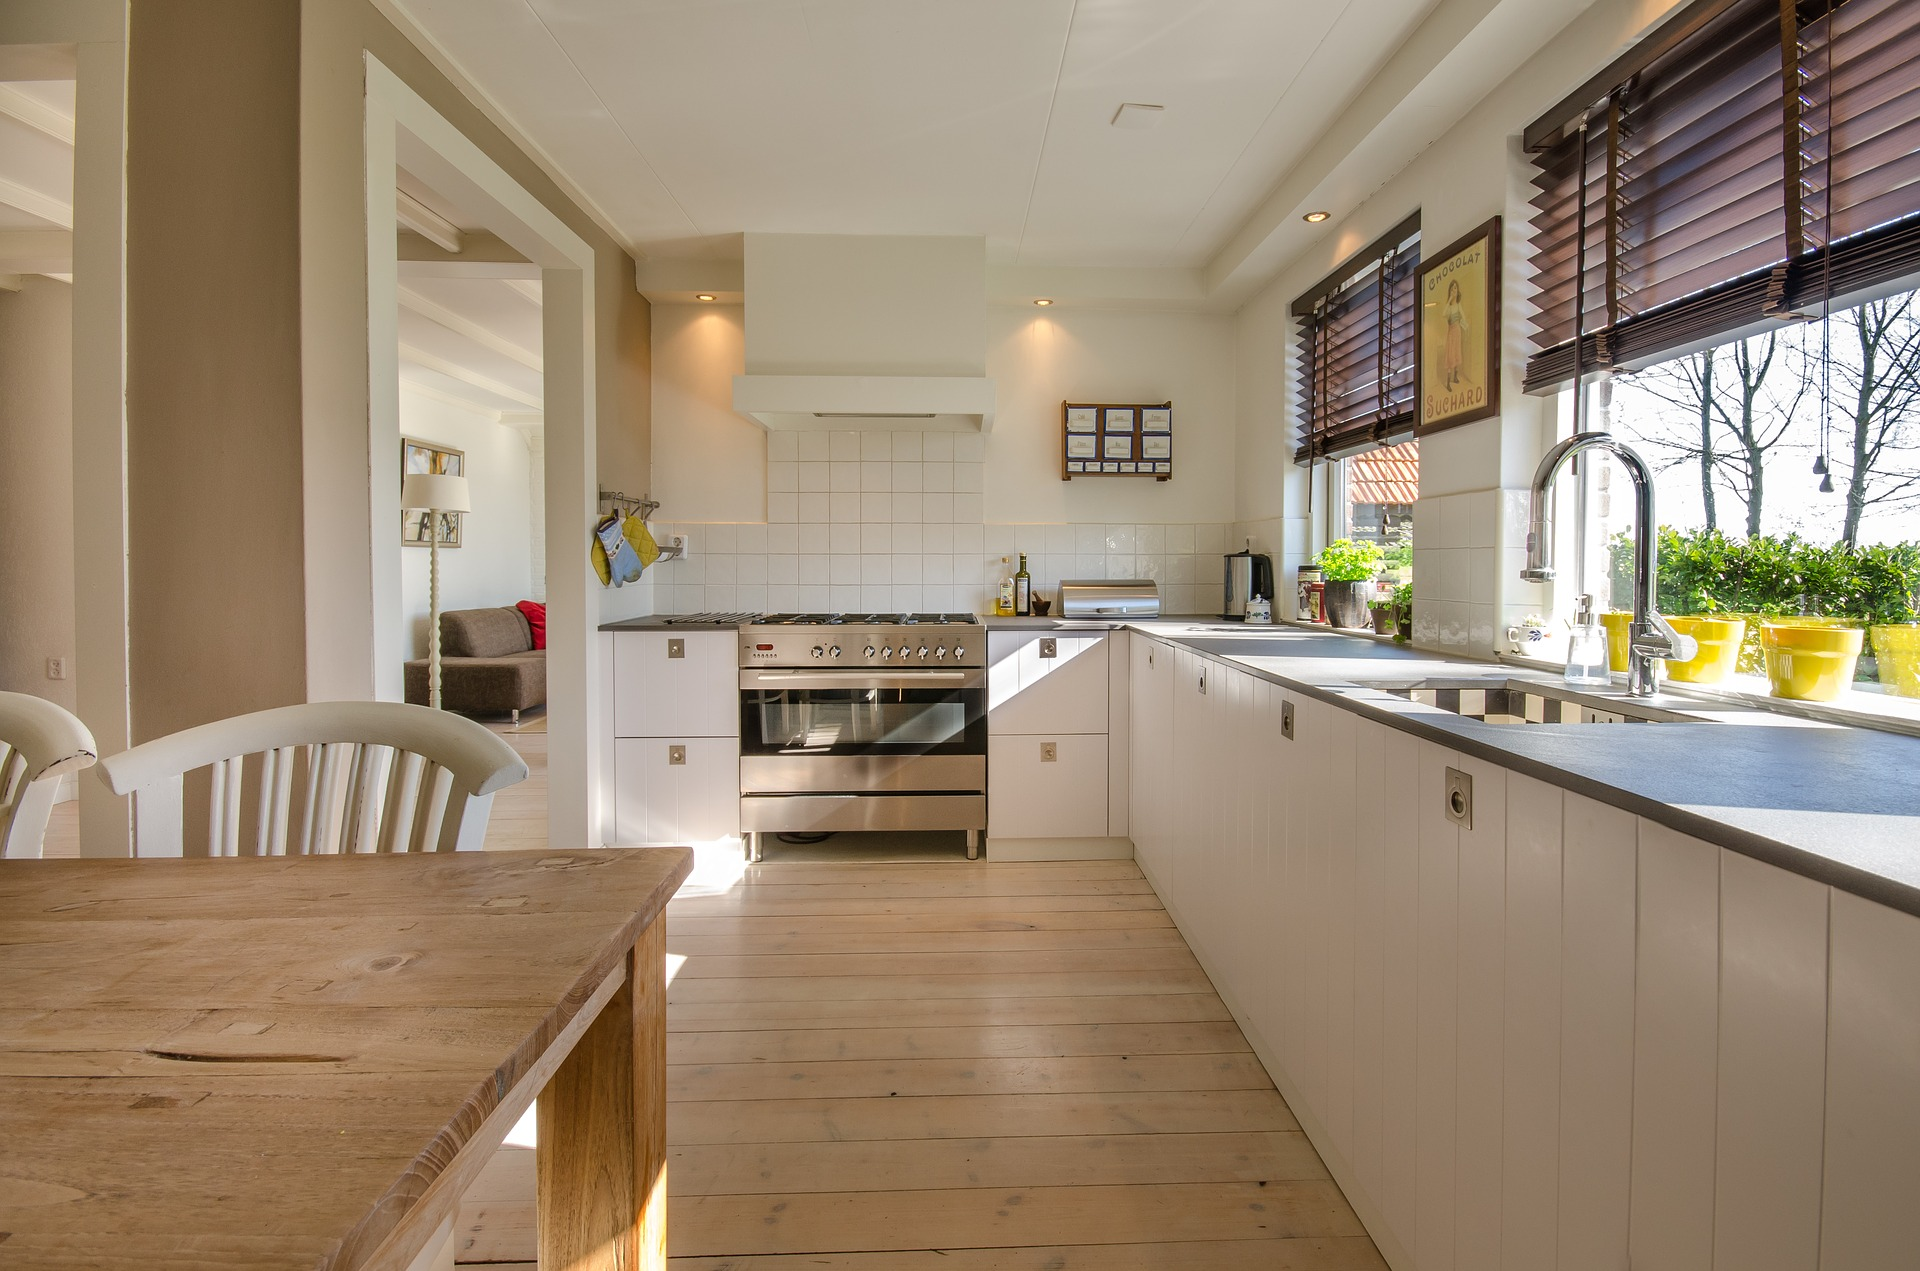 uklizená kuchyň